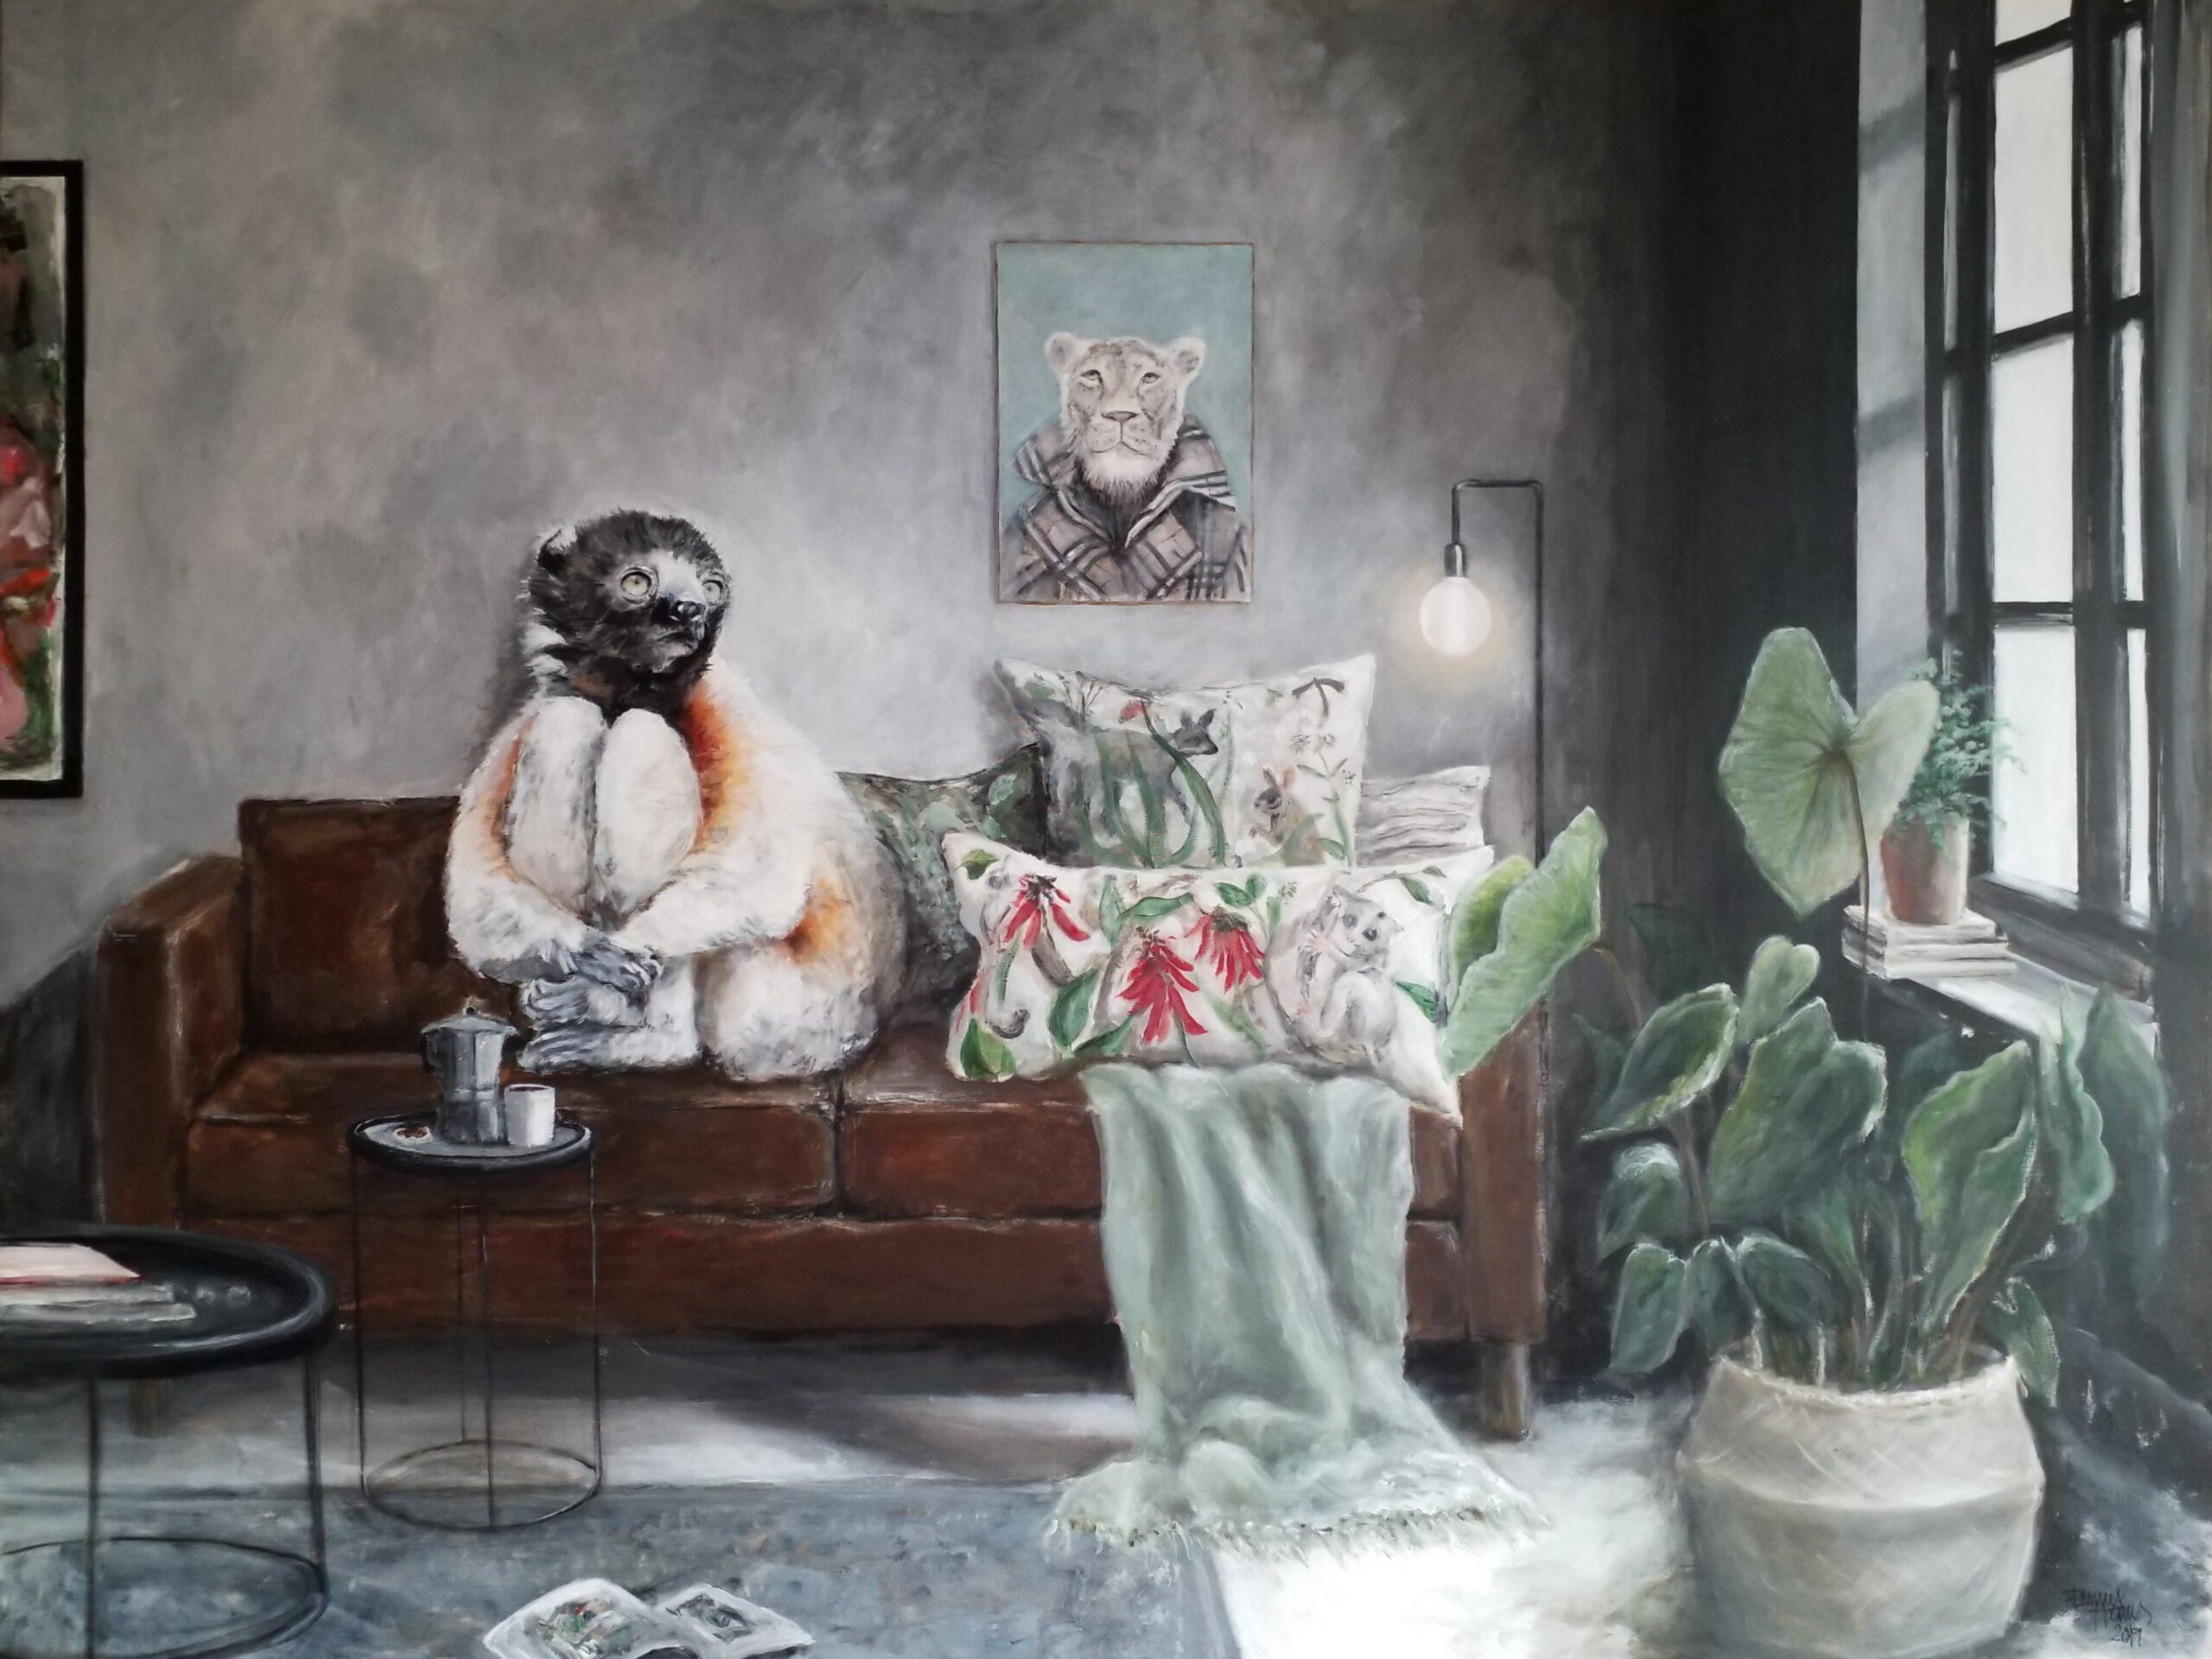 Innsikt2 120x160 cm akryl på lerret © Emmy Harnes Emmy Harnes billedkunstner billedkunst Haslum Bærum kunstner figurativ kunst antropomorfisk eventyrlig artist art anthropomorphicart